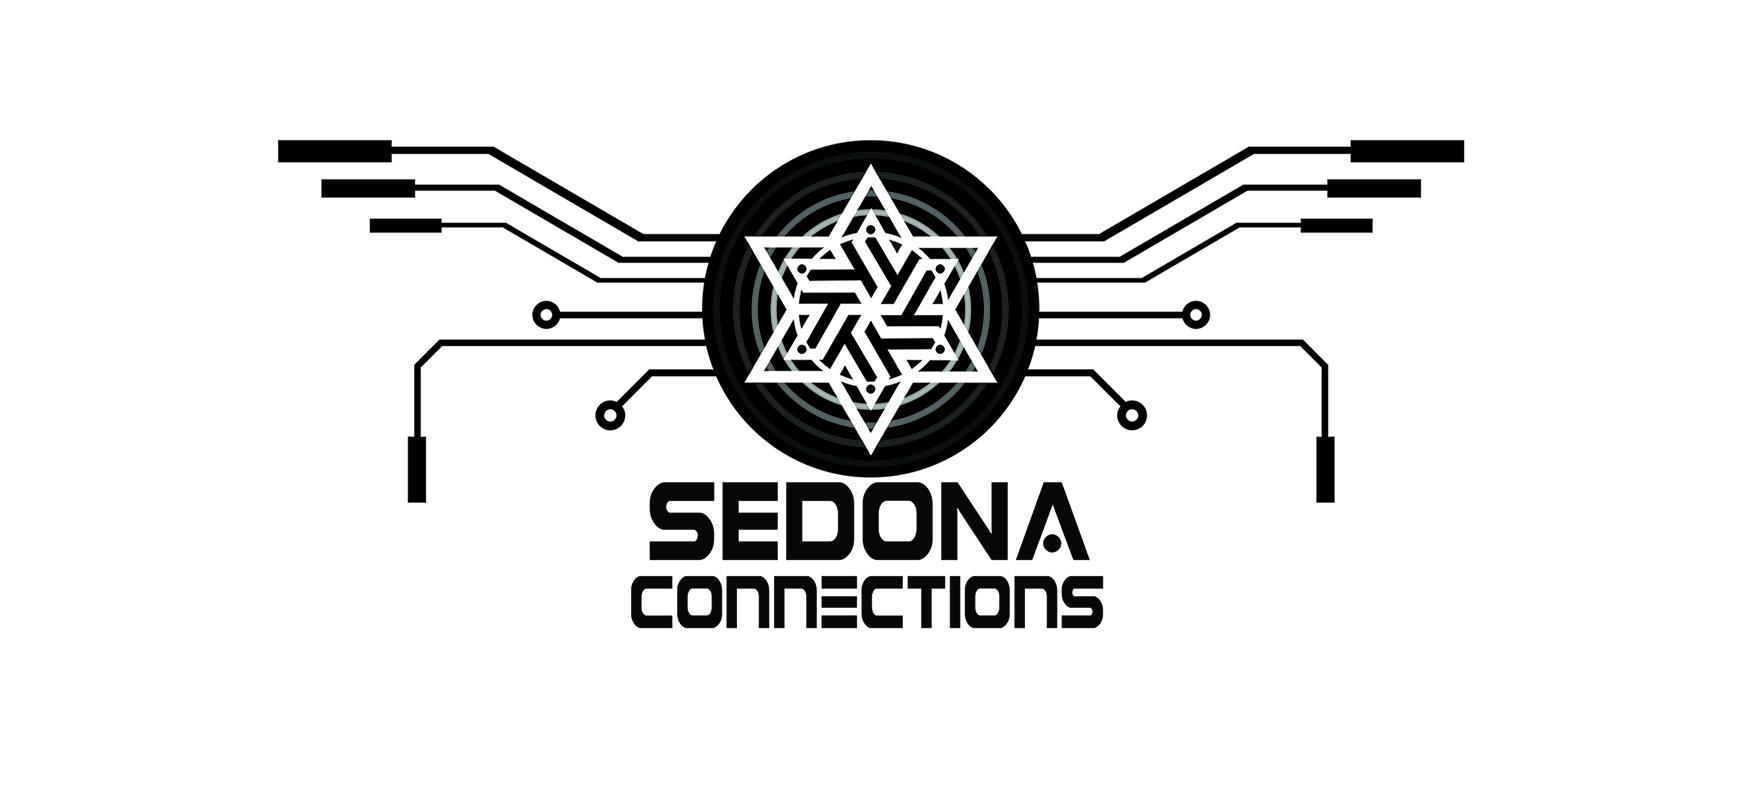 04 NewSedona Connectionslogo01.jpg